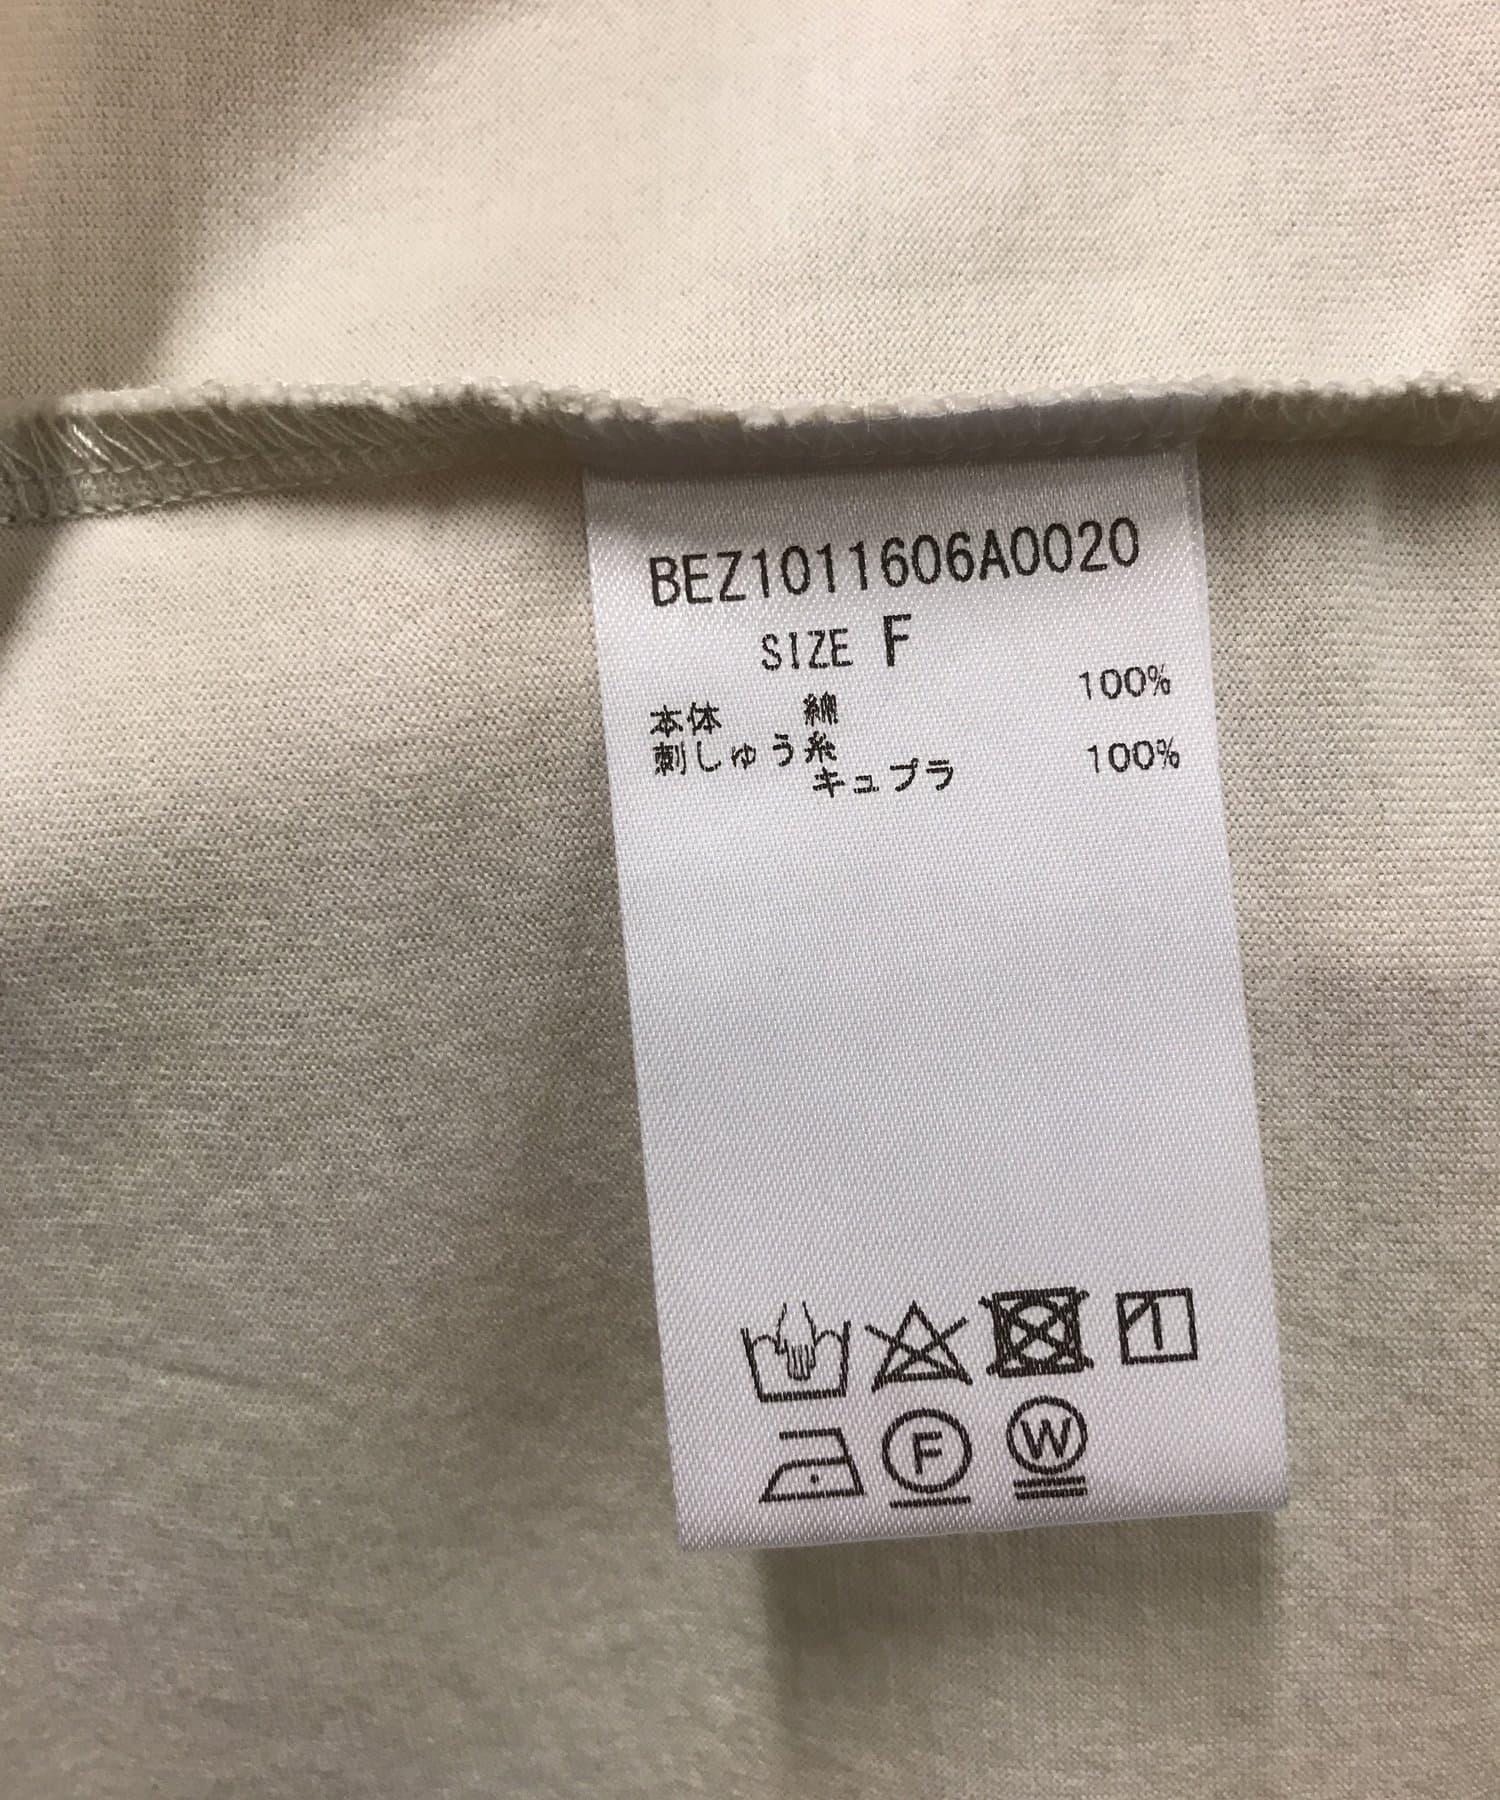 BEARDSLEY(ビアズリー) ソーダ刺繍Tシャツ